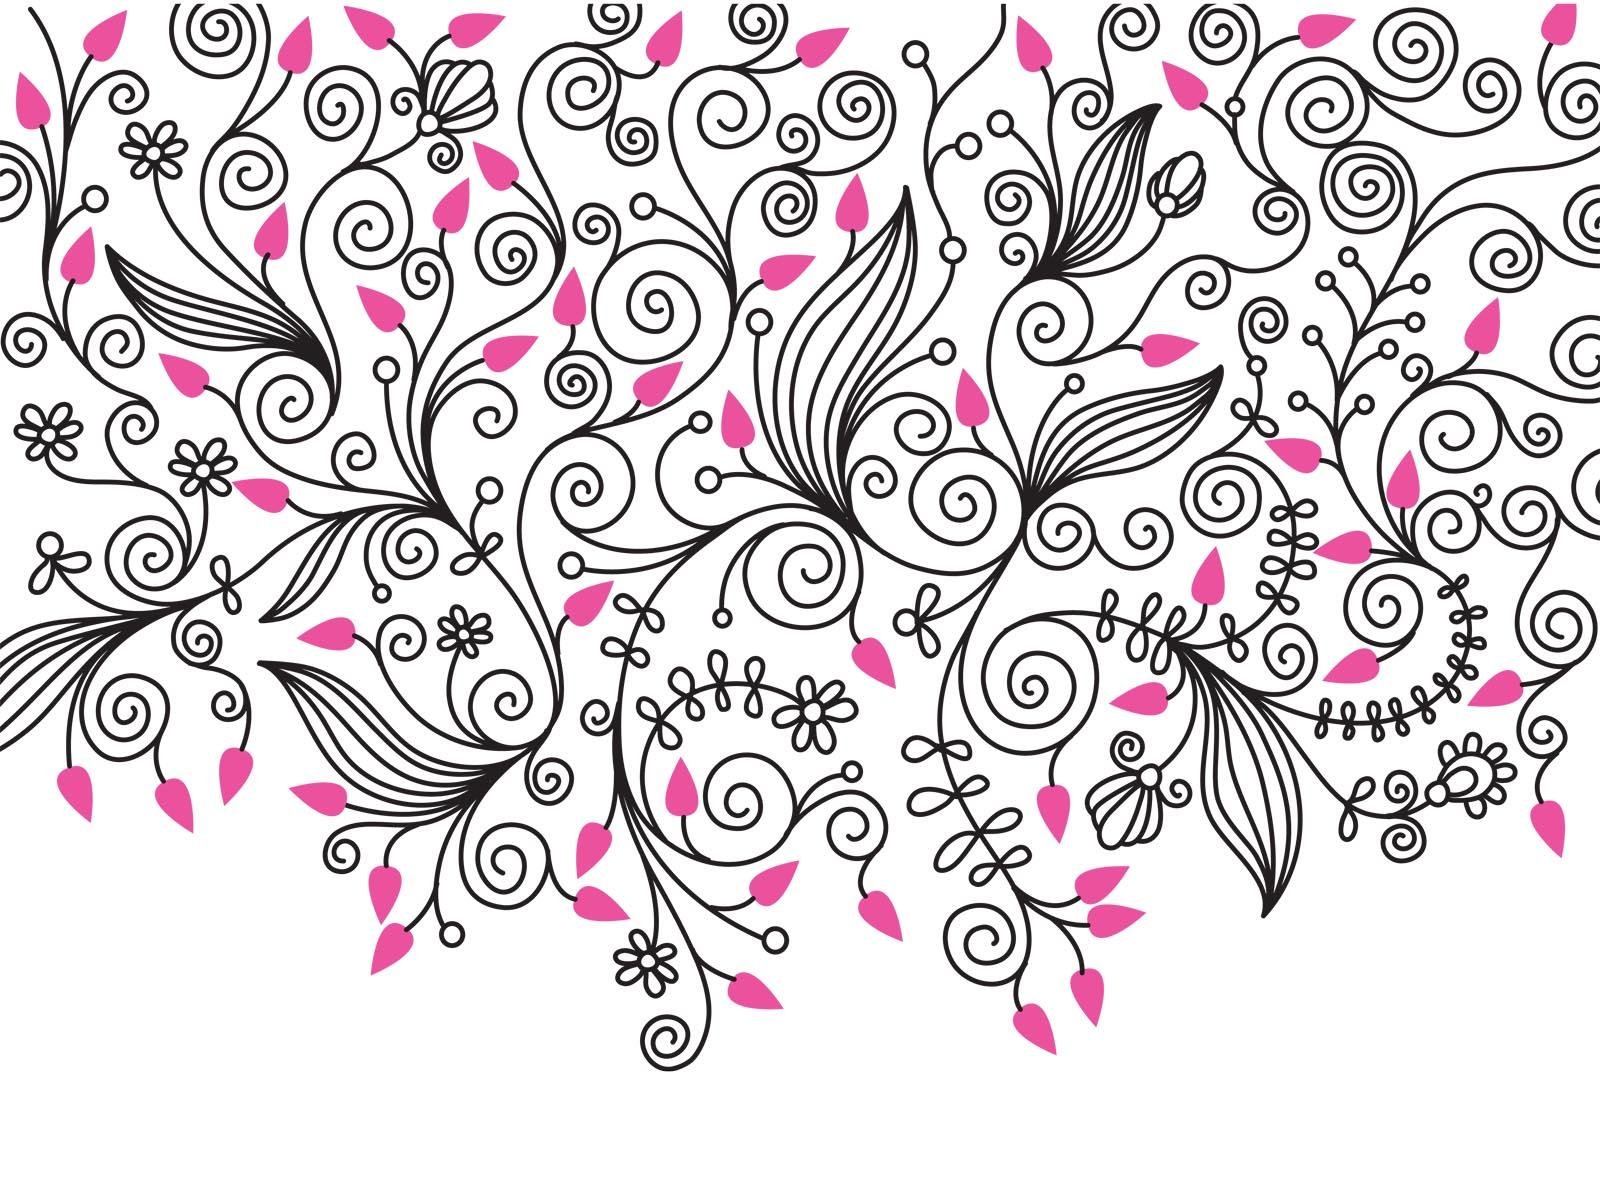 swirly roses background bouquet - photo #47